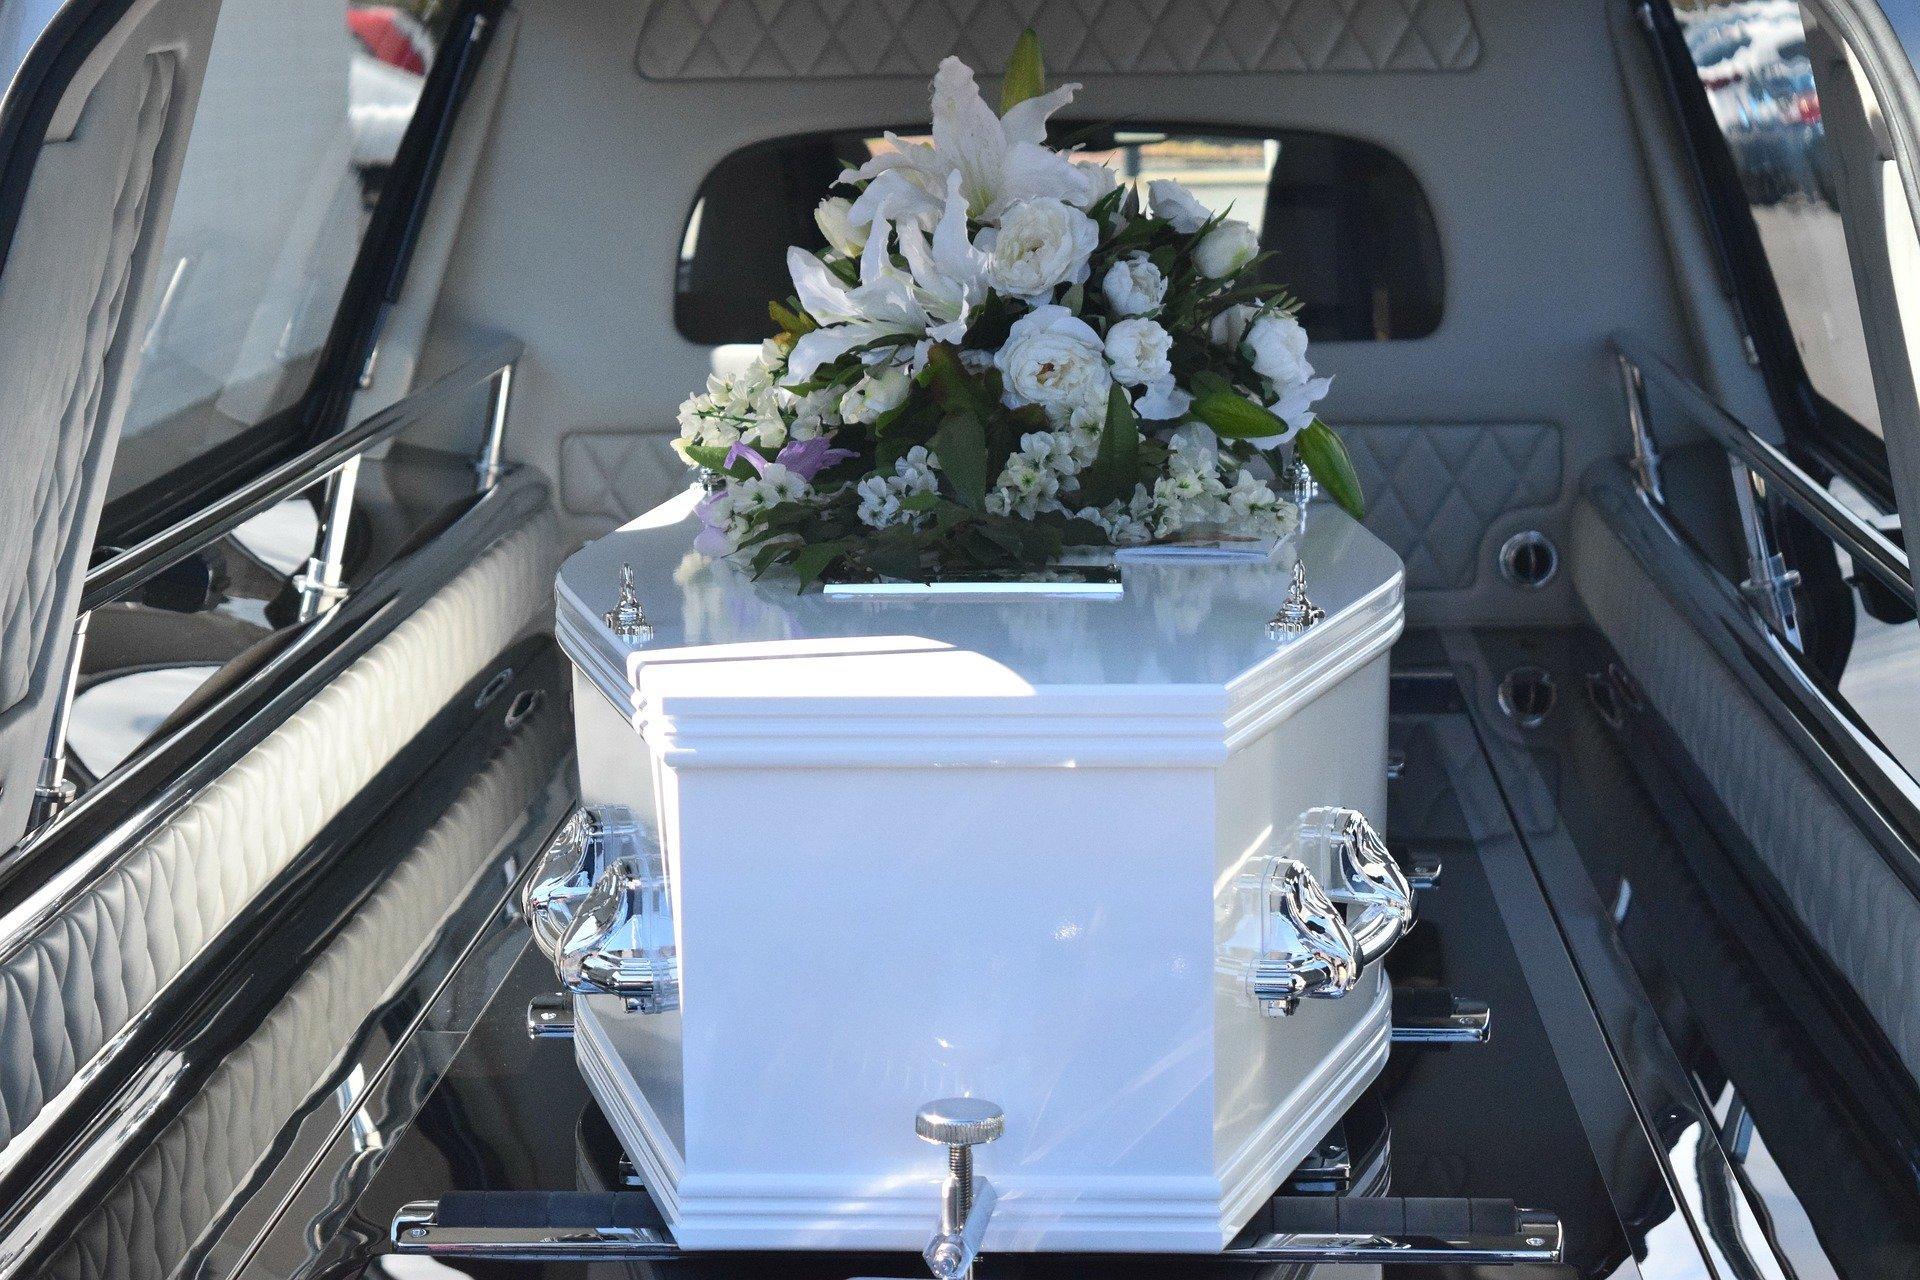 Ile trwa pogrzeb?